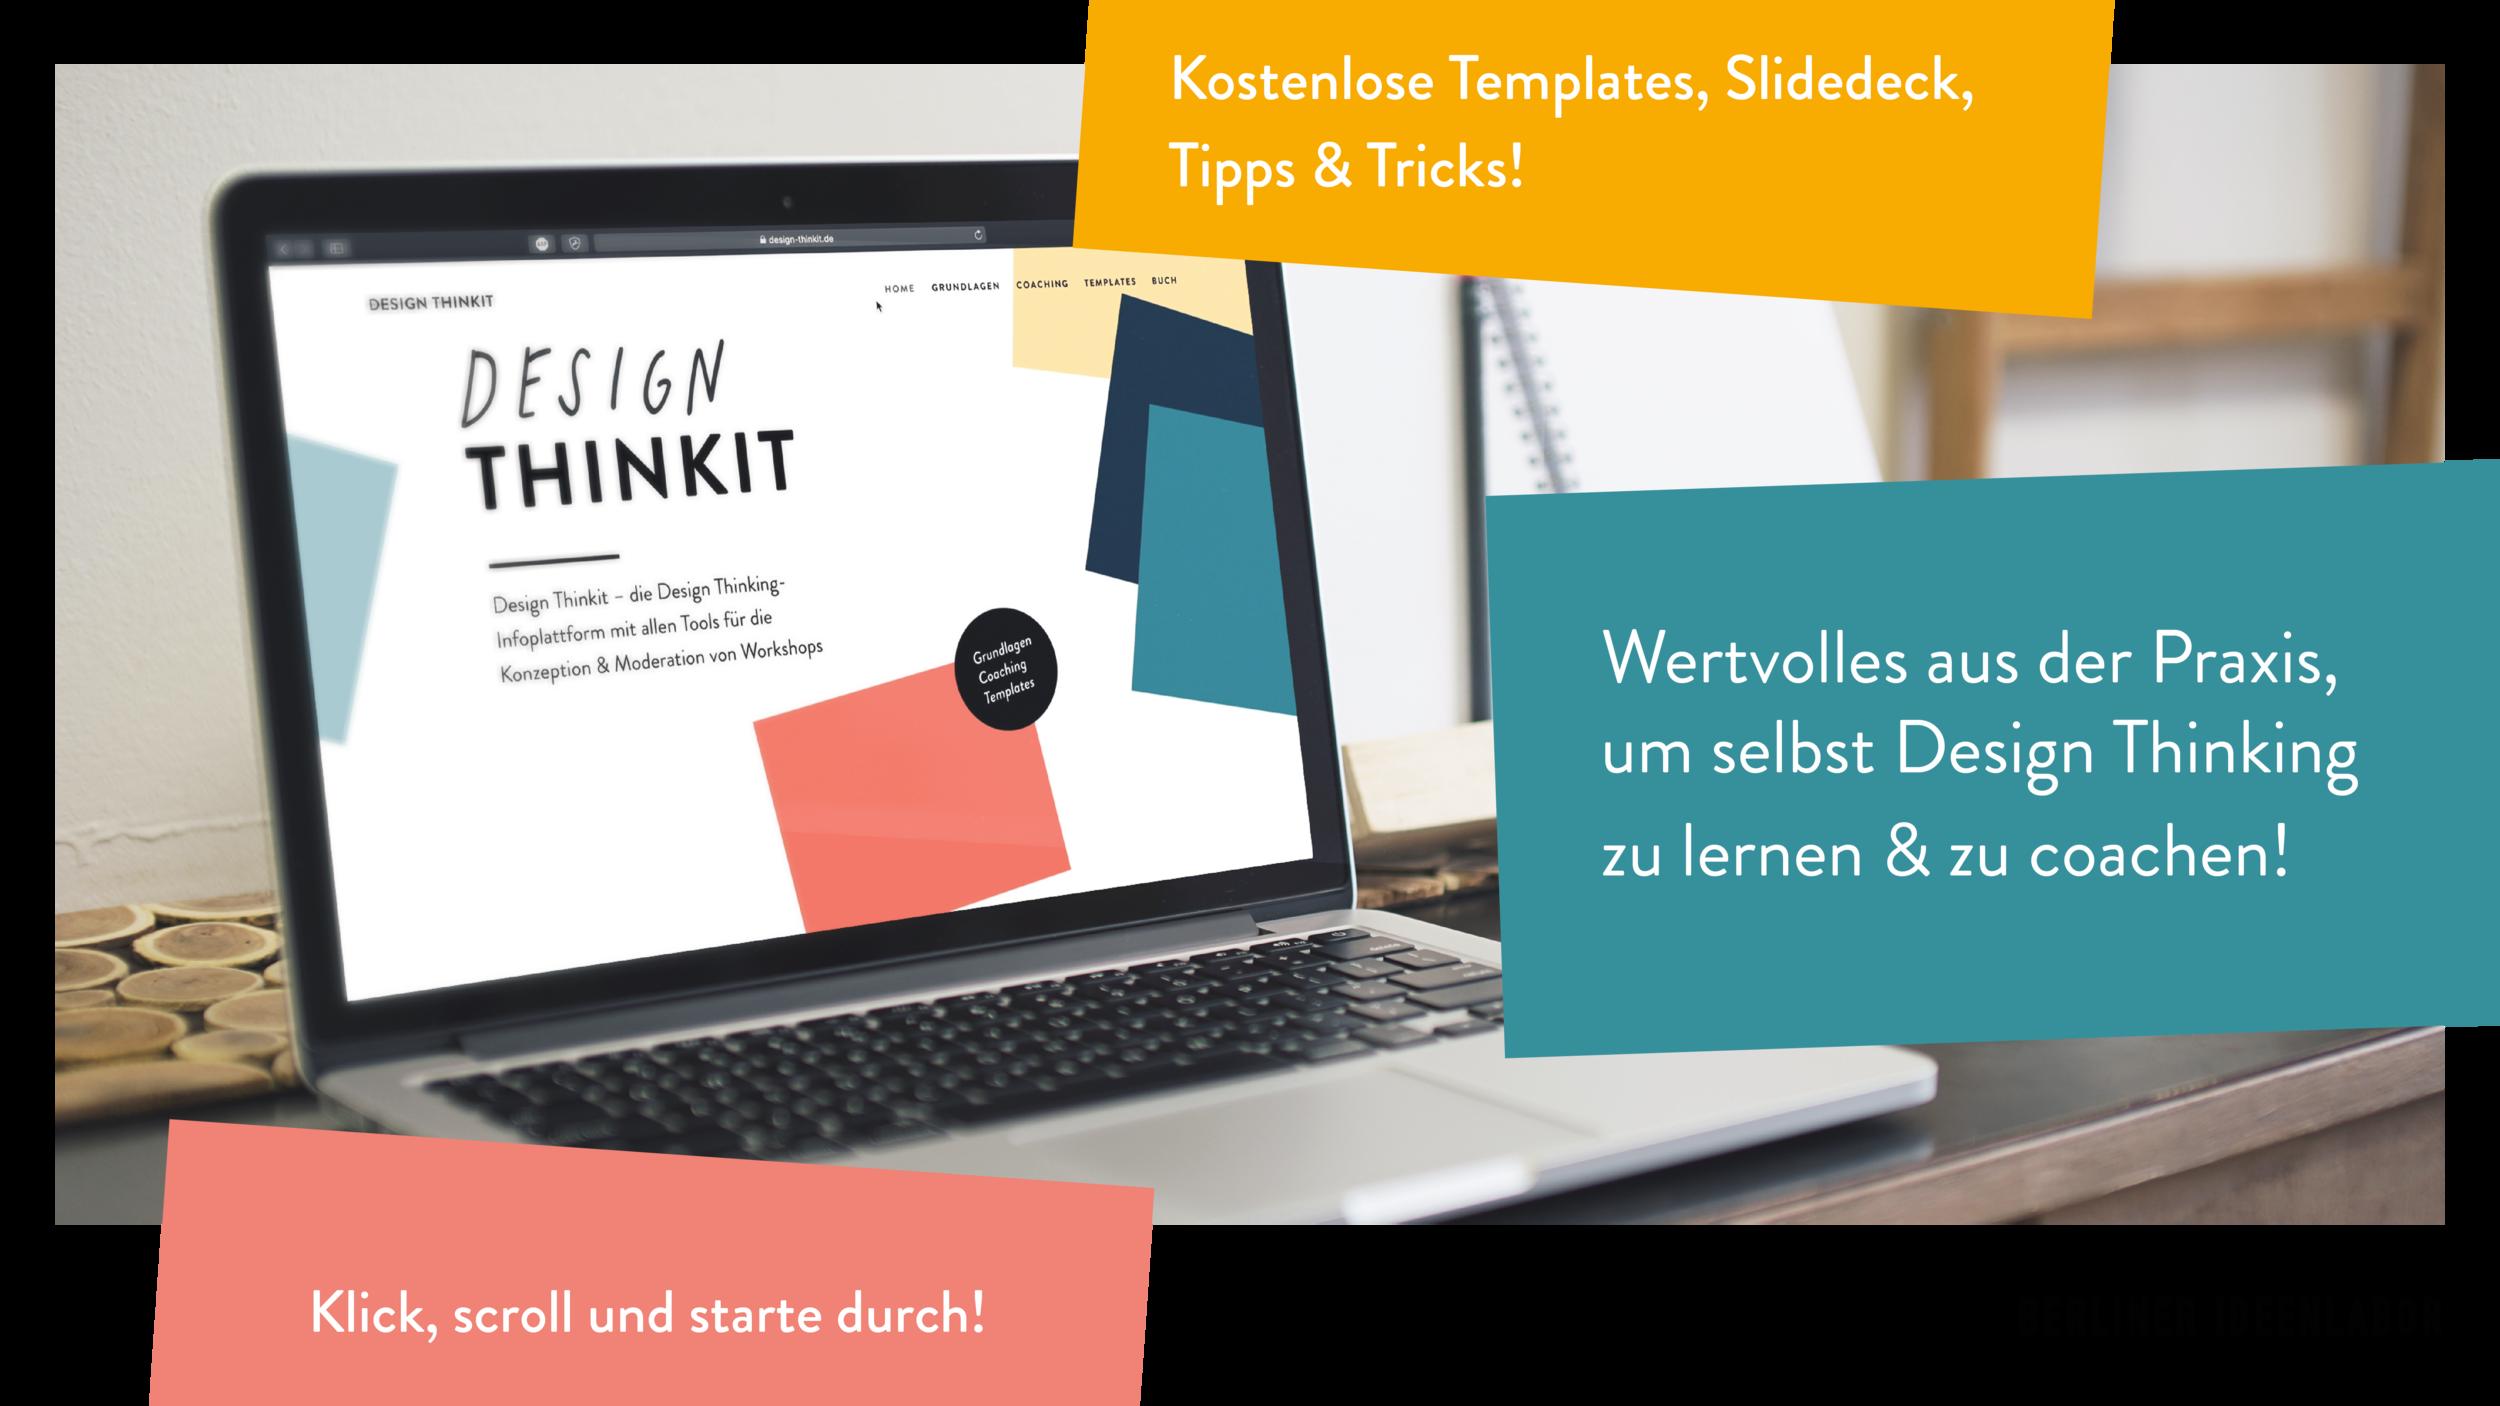 Design Thinkit